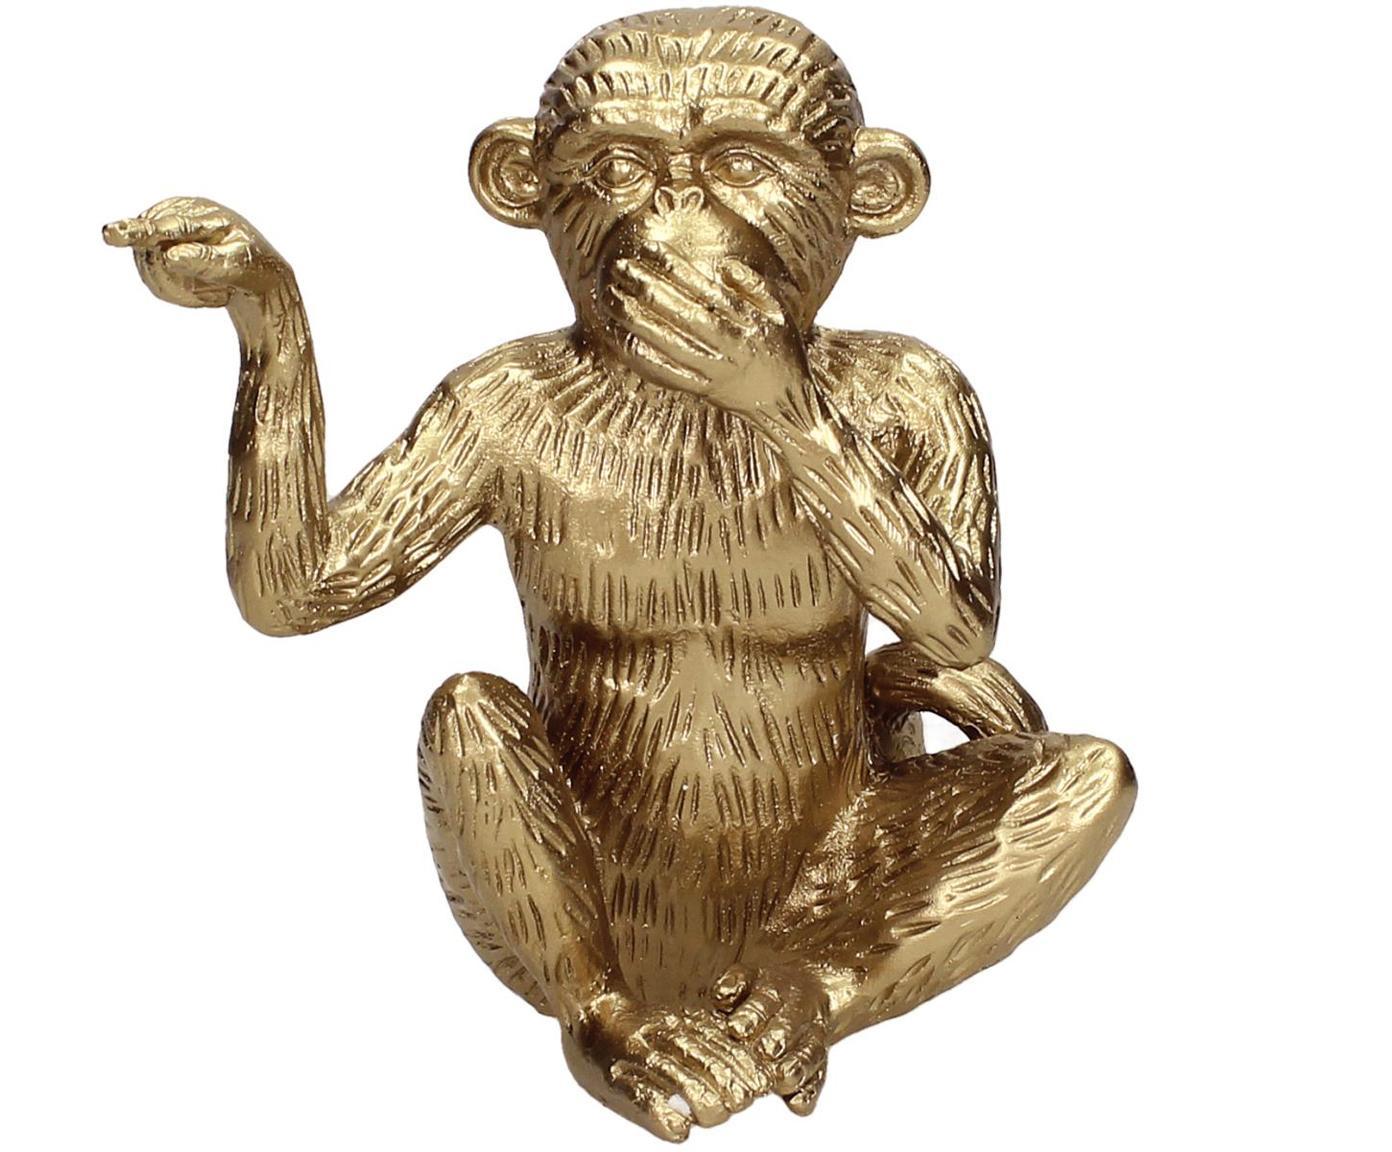 Oggetto decorativo Monkey, Poliresina, Dorato, Larg. 14 x Alt. 15 cm